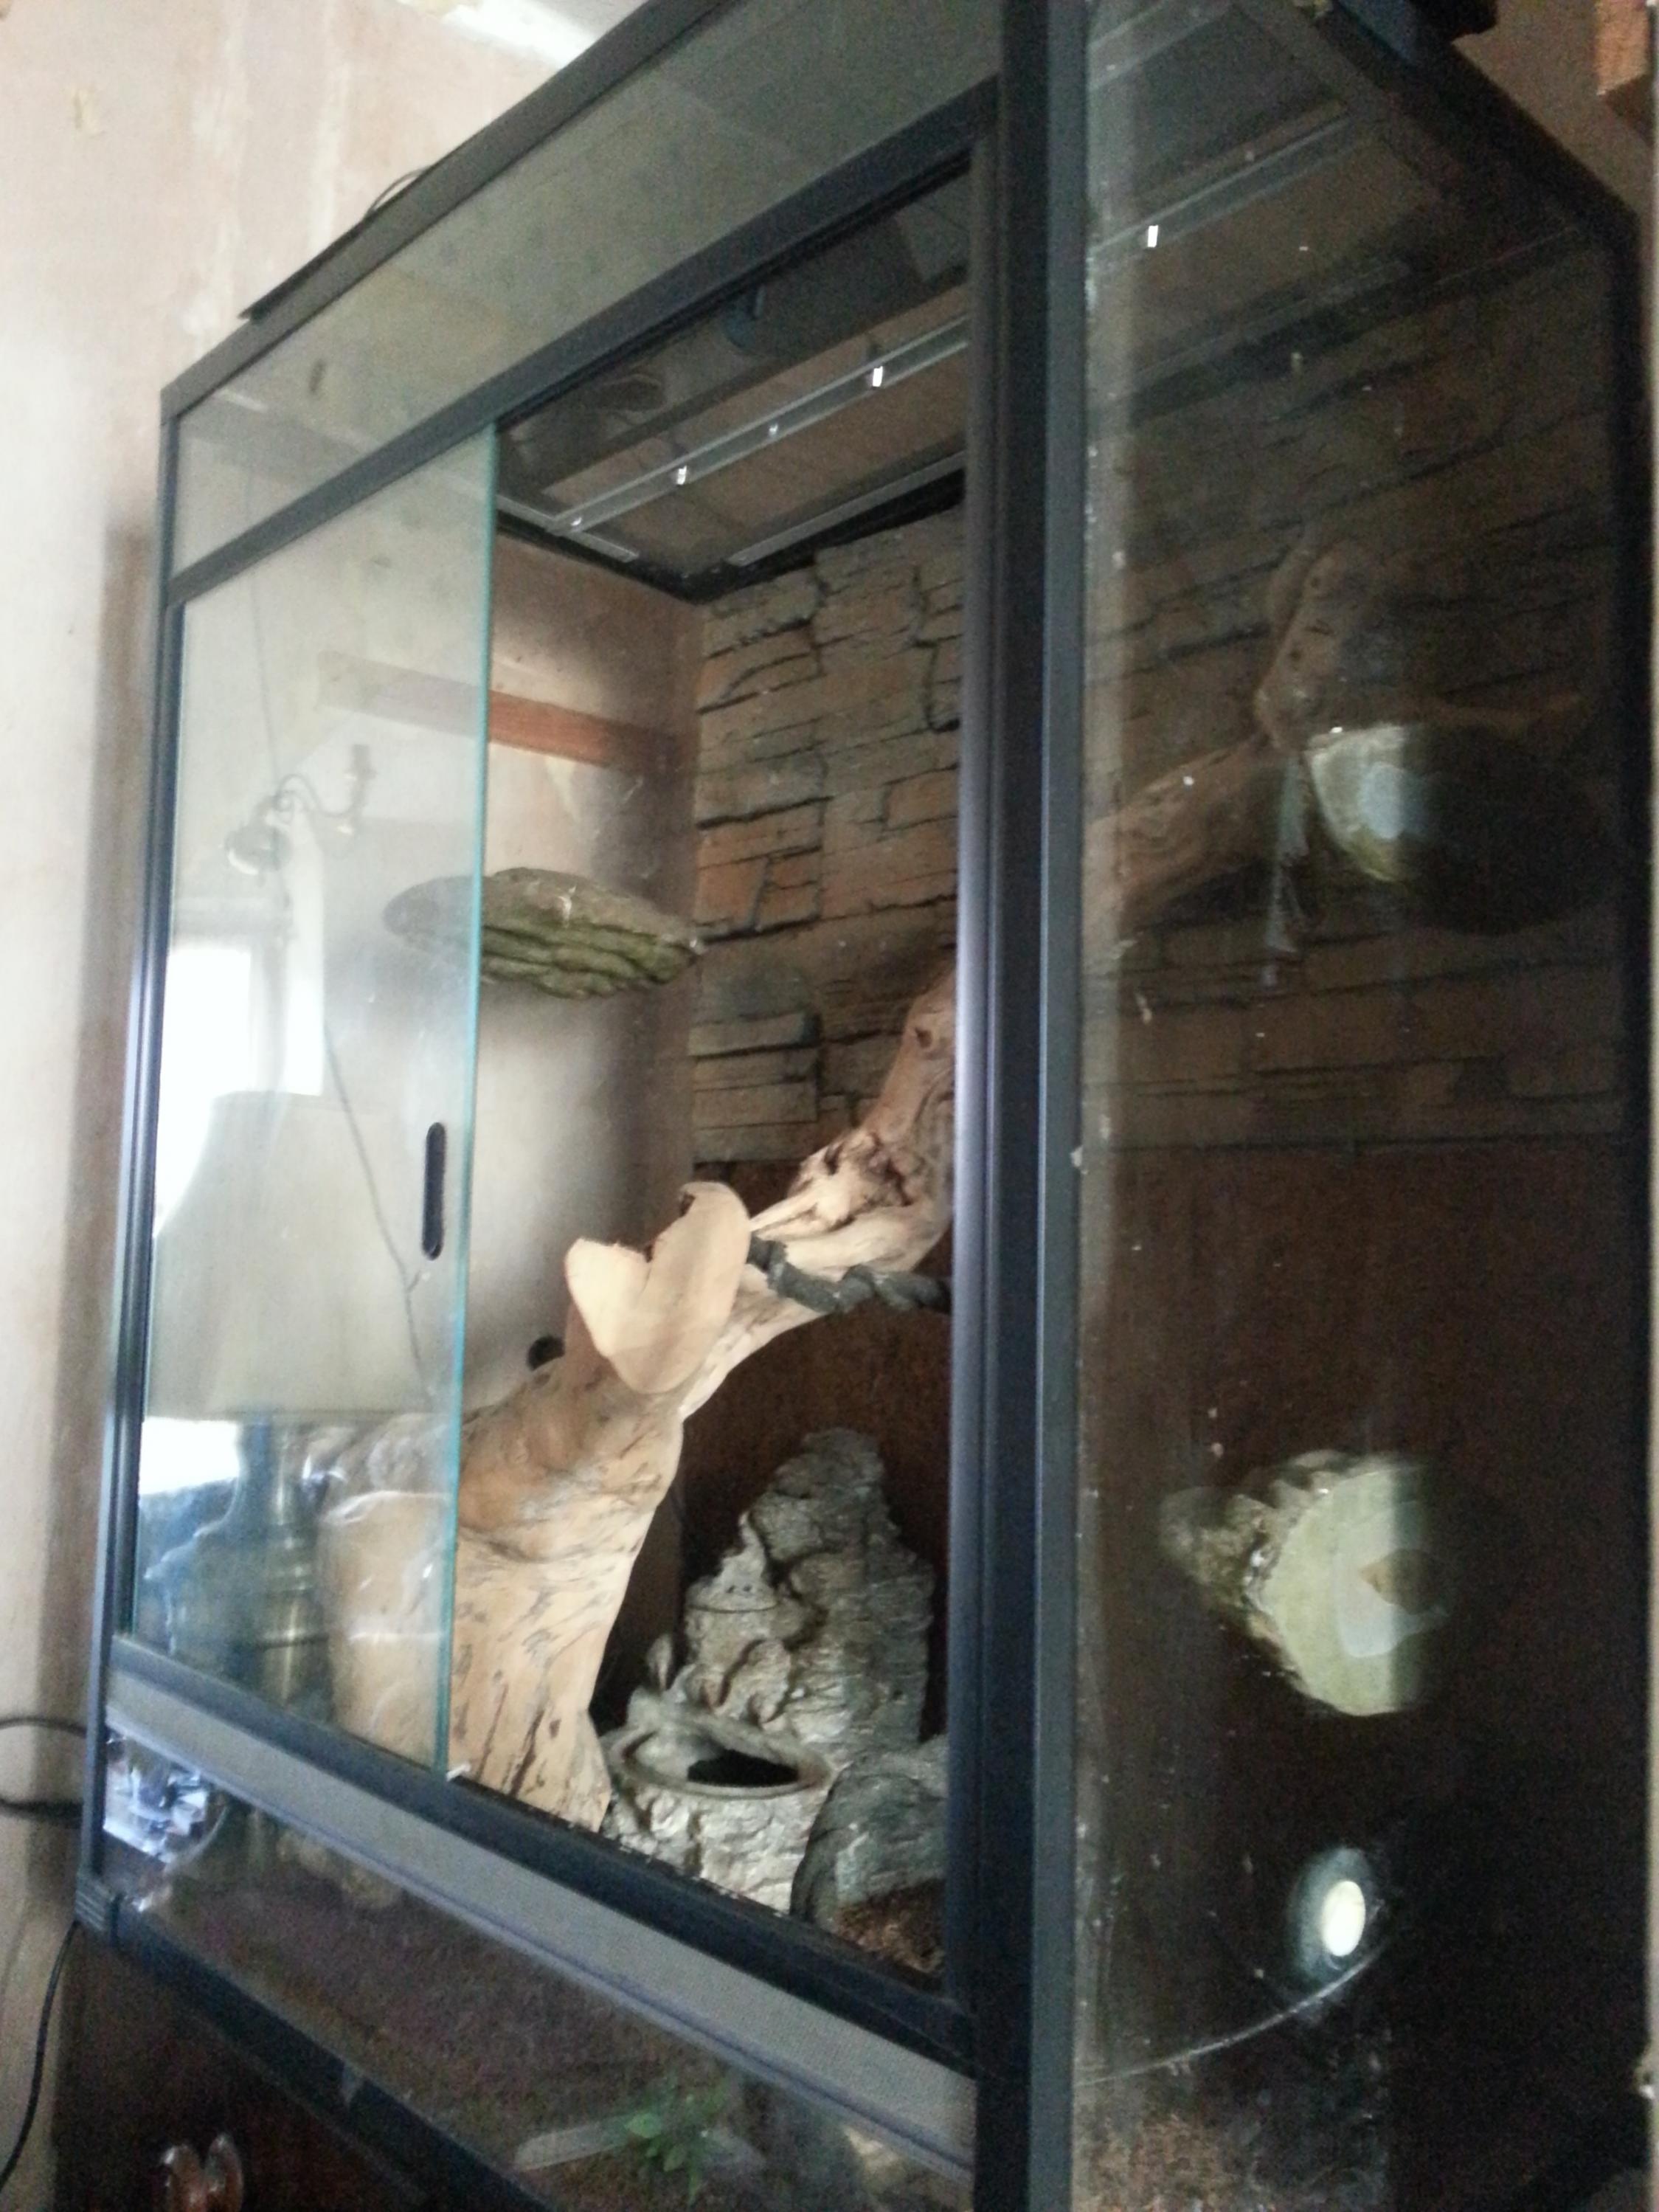 Nw England Rare Huge Glass Vivarium Terrarium And Extras Reptile